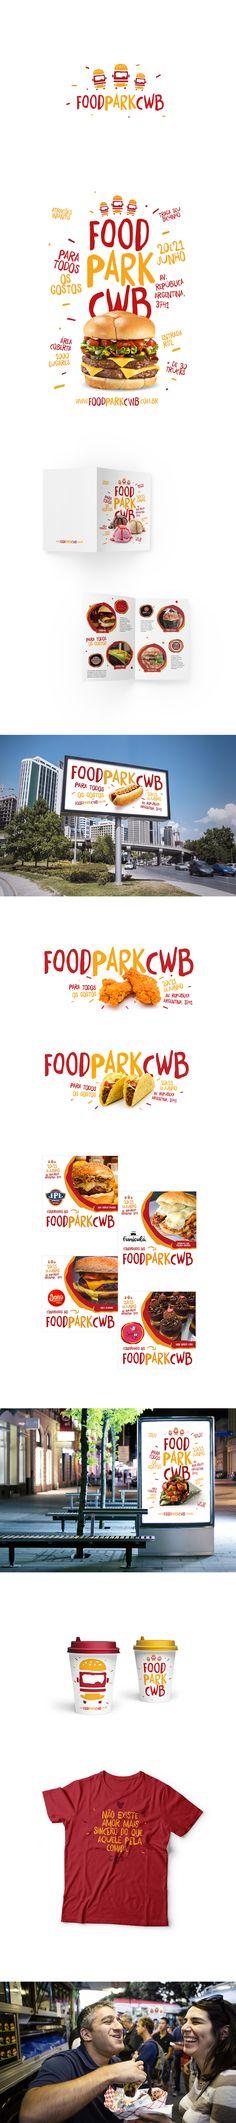 Food Park CWB on Behance